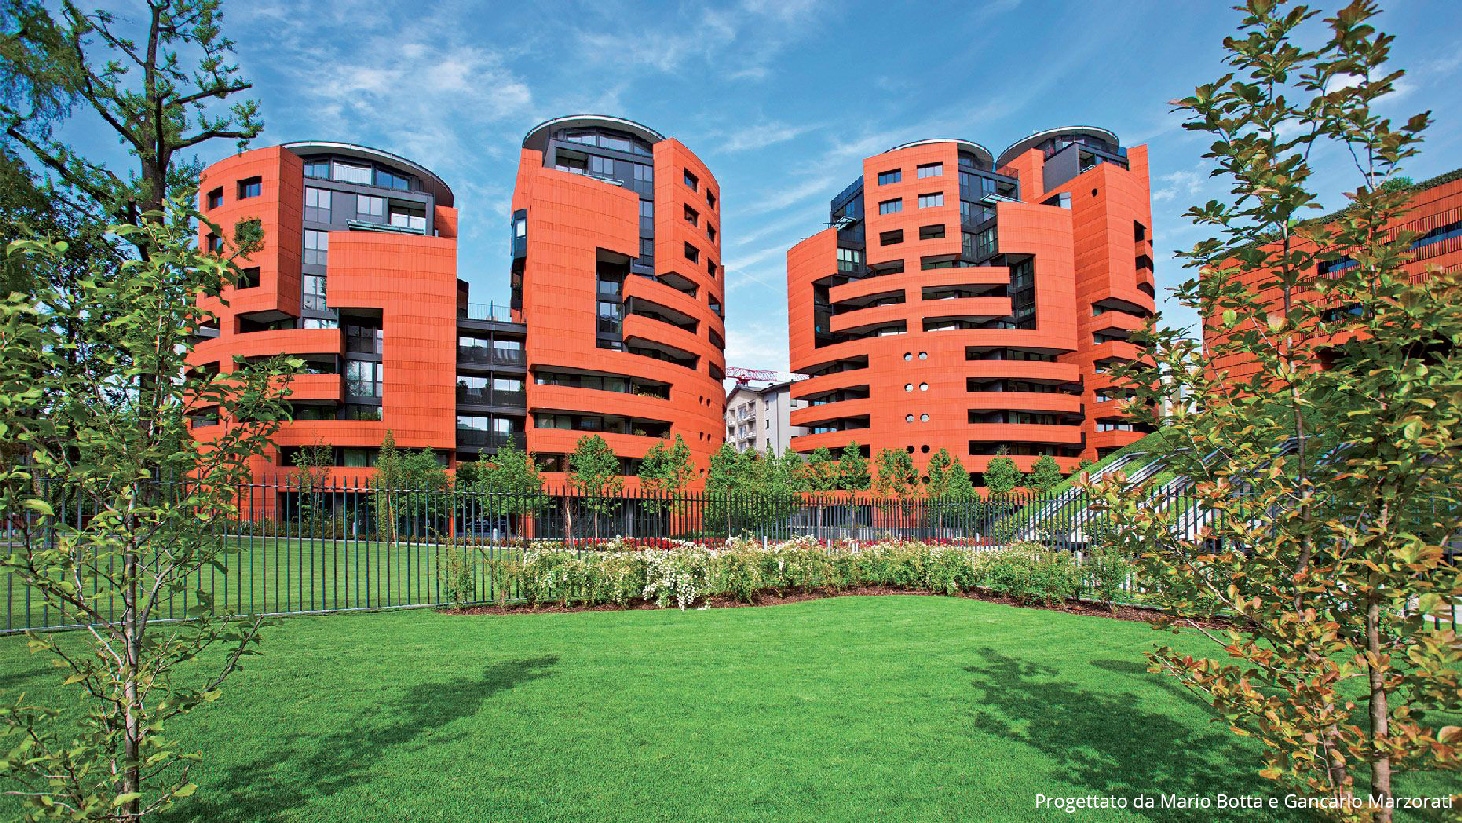 Penthouse in Milan - Campari Towers